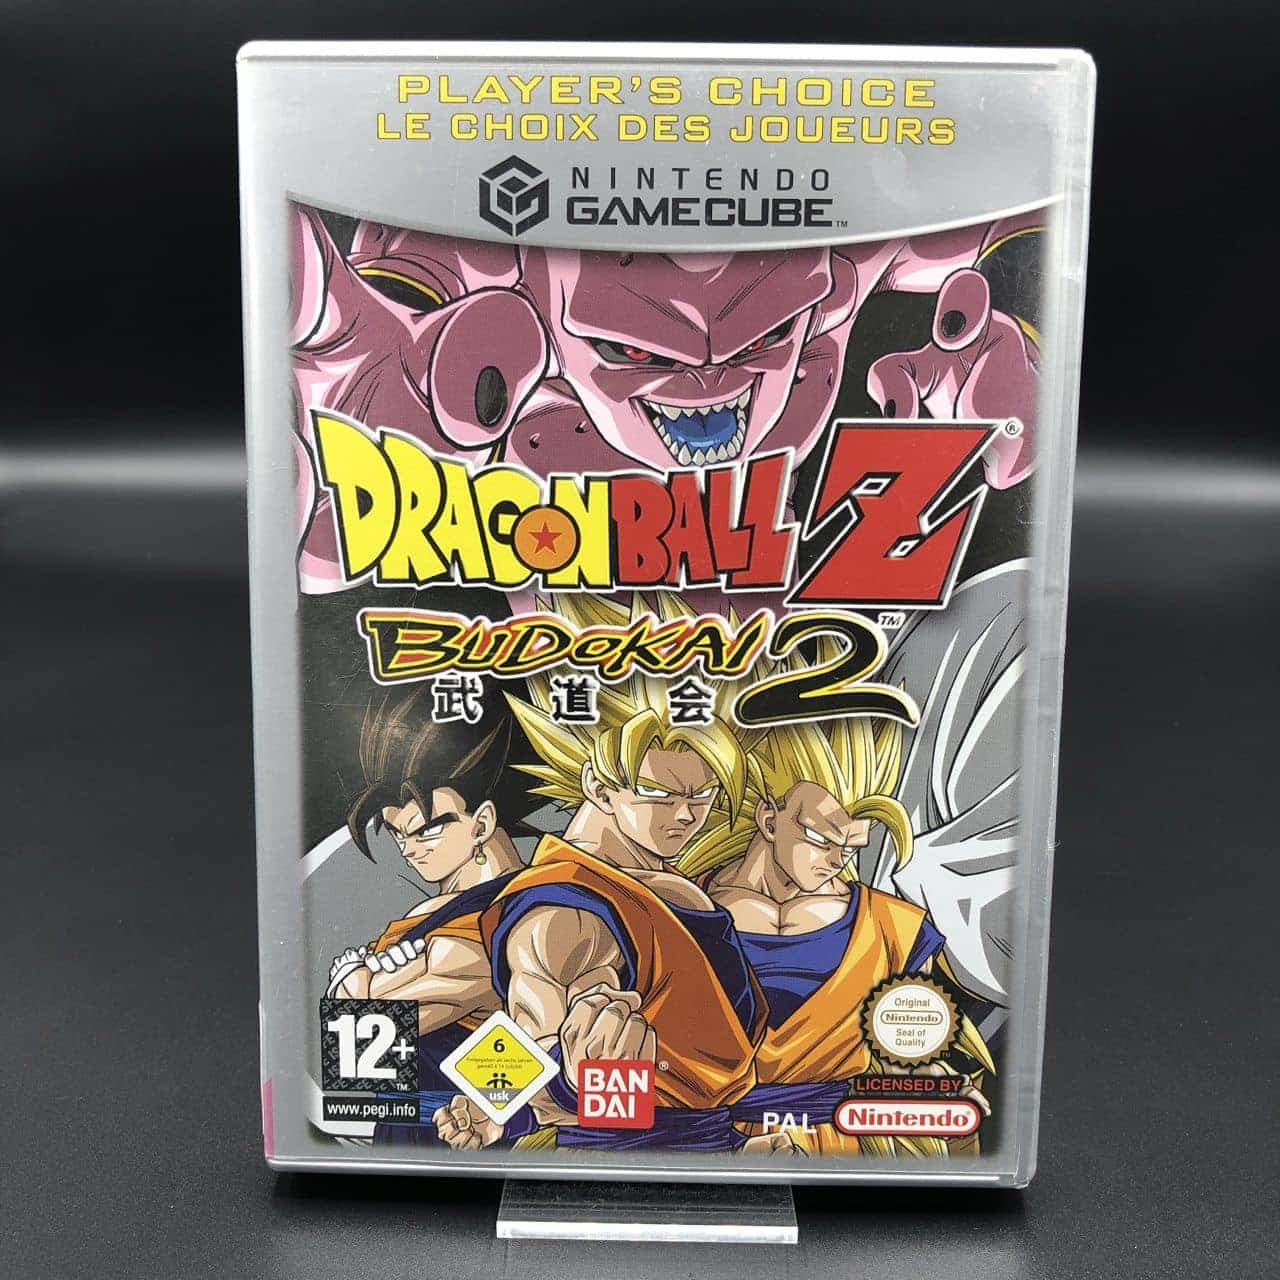 GC Dragon Ball Z: Budokai 2 (Player's Choice) (ohne Anleitung) (Gut) Nintendo GameCube